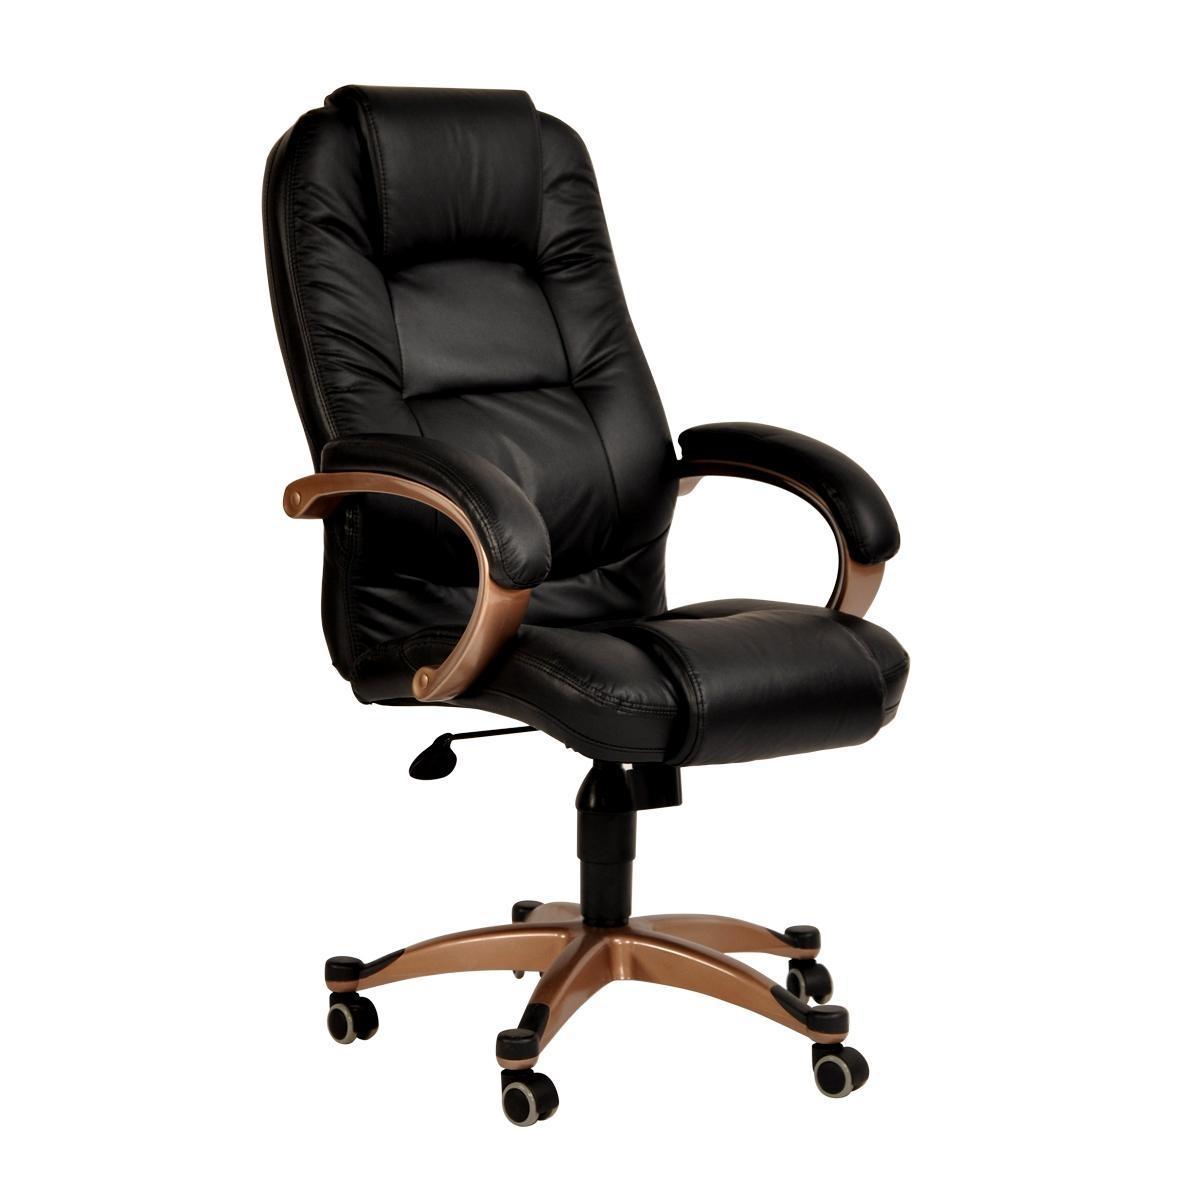 foto silla de oficina toronto color negro foto 41654. Black Bedroom Furniture Sets. Home Design Ideas